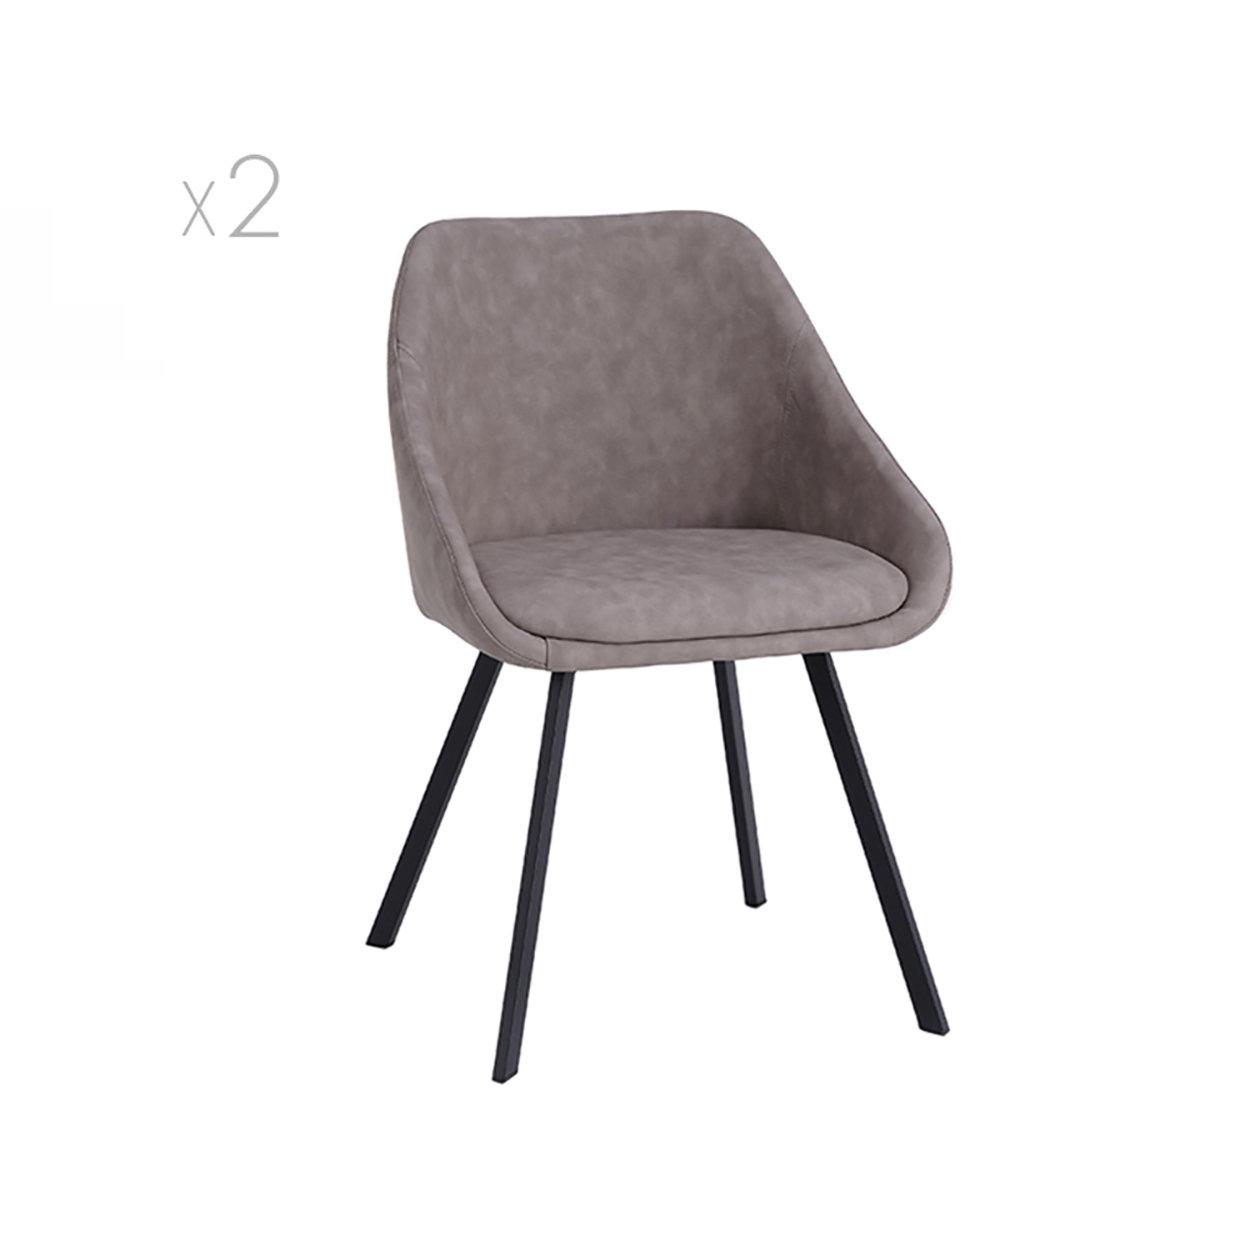 Set Of 2 Chairs Monza Melange Dove Dove Tavoli E Sedie Purchase On Ventis